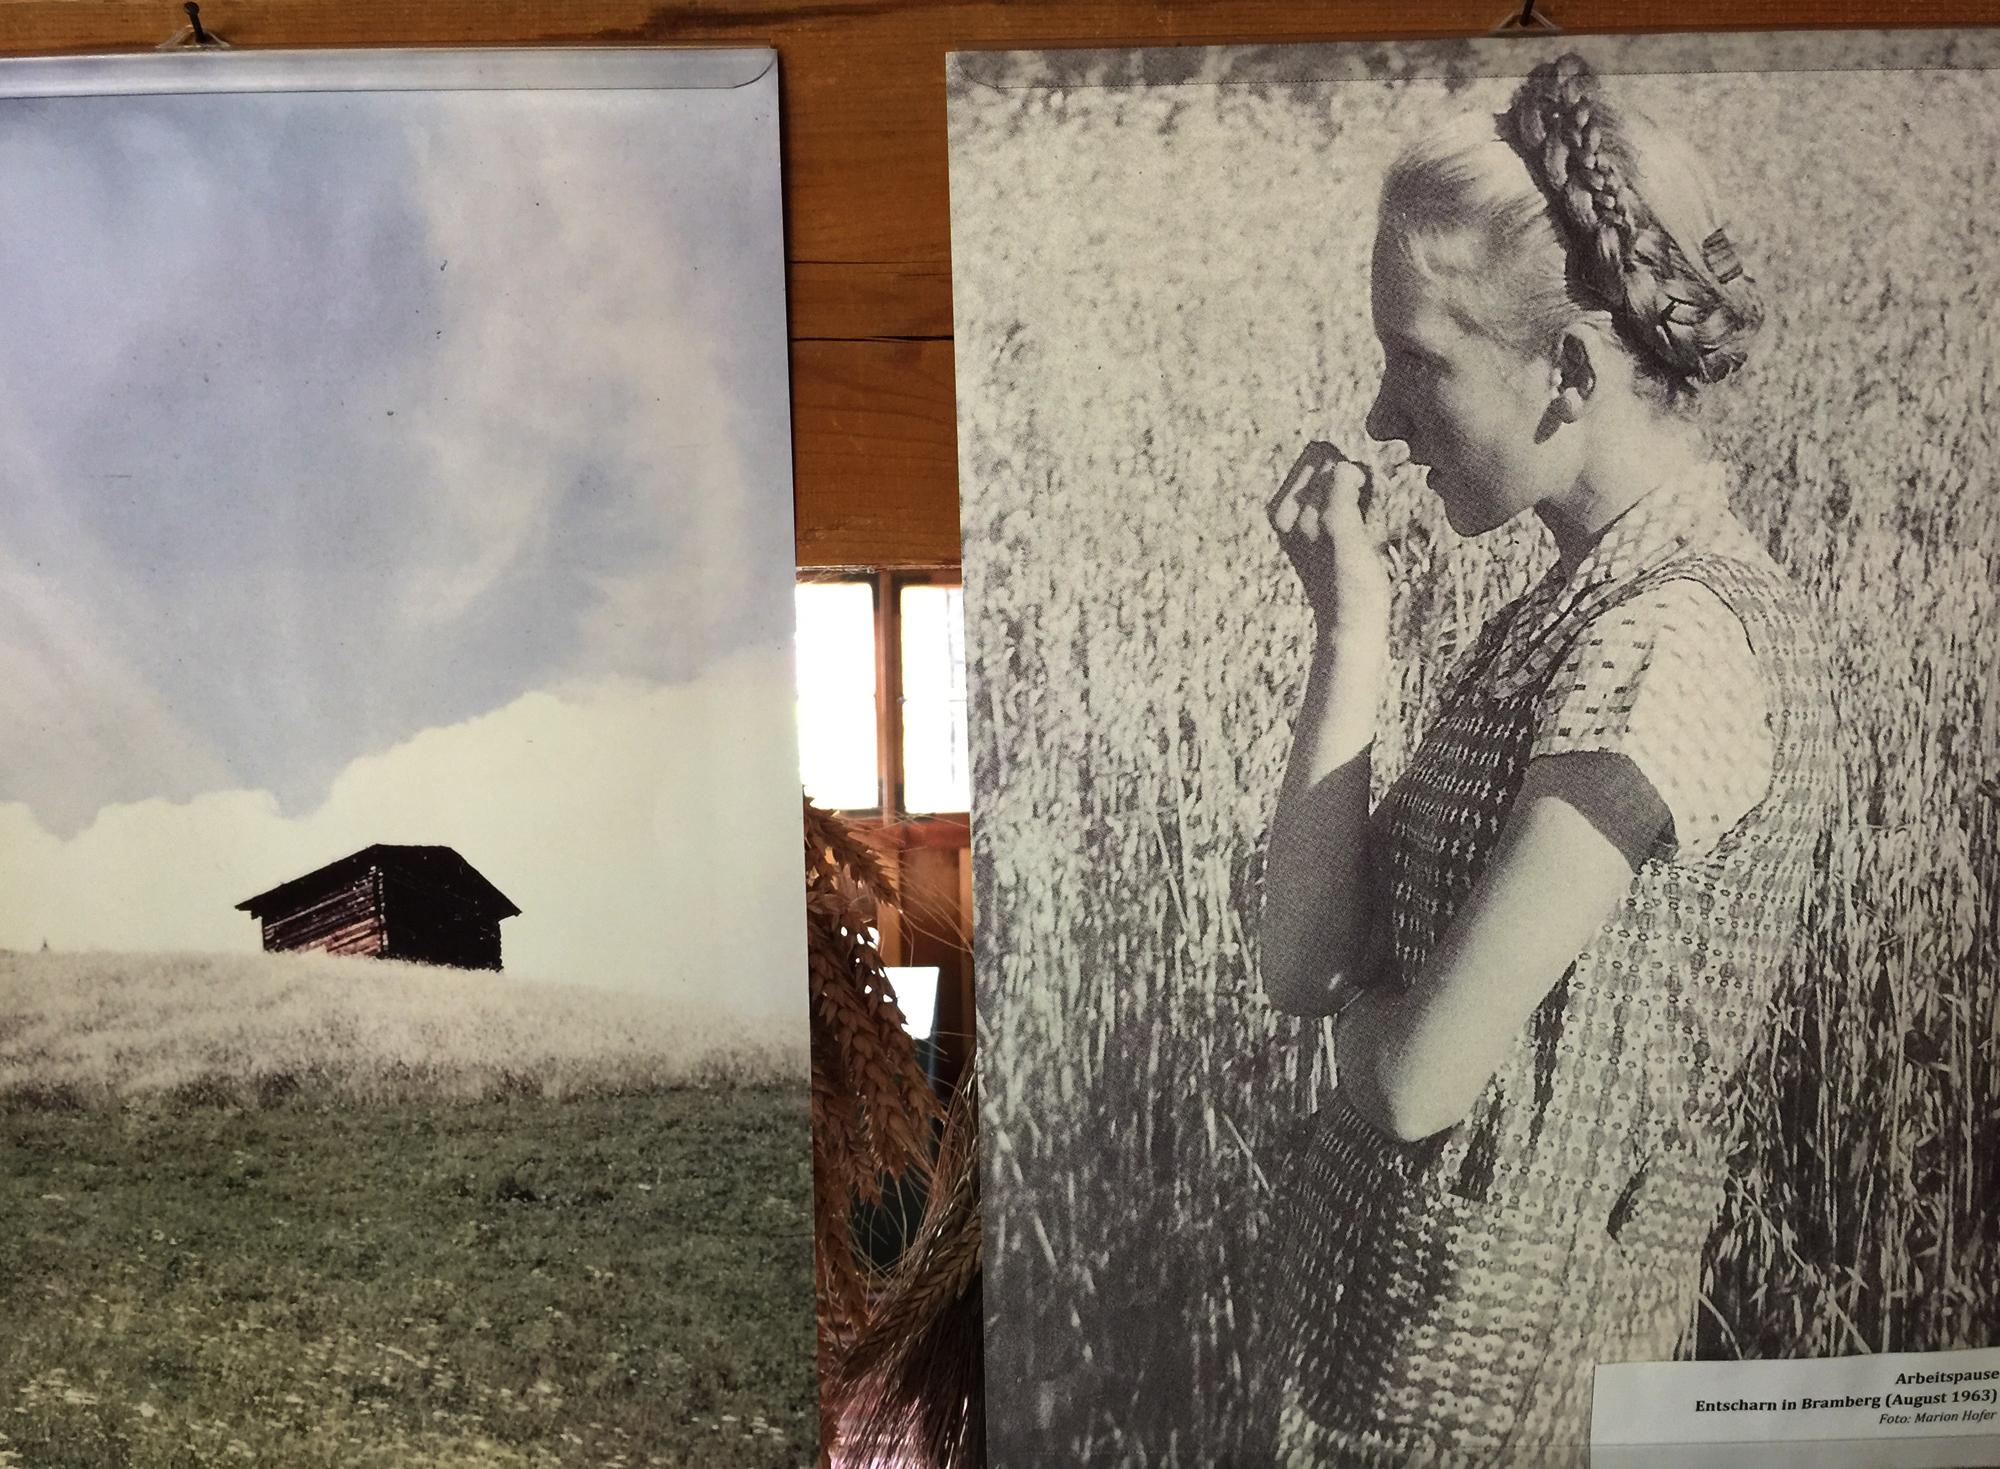 Bilderausstellung im Samplhaus